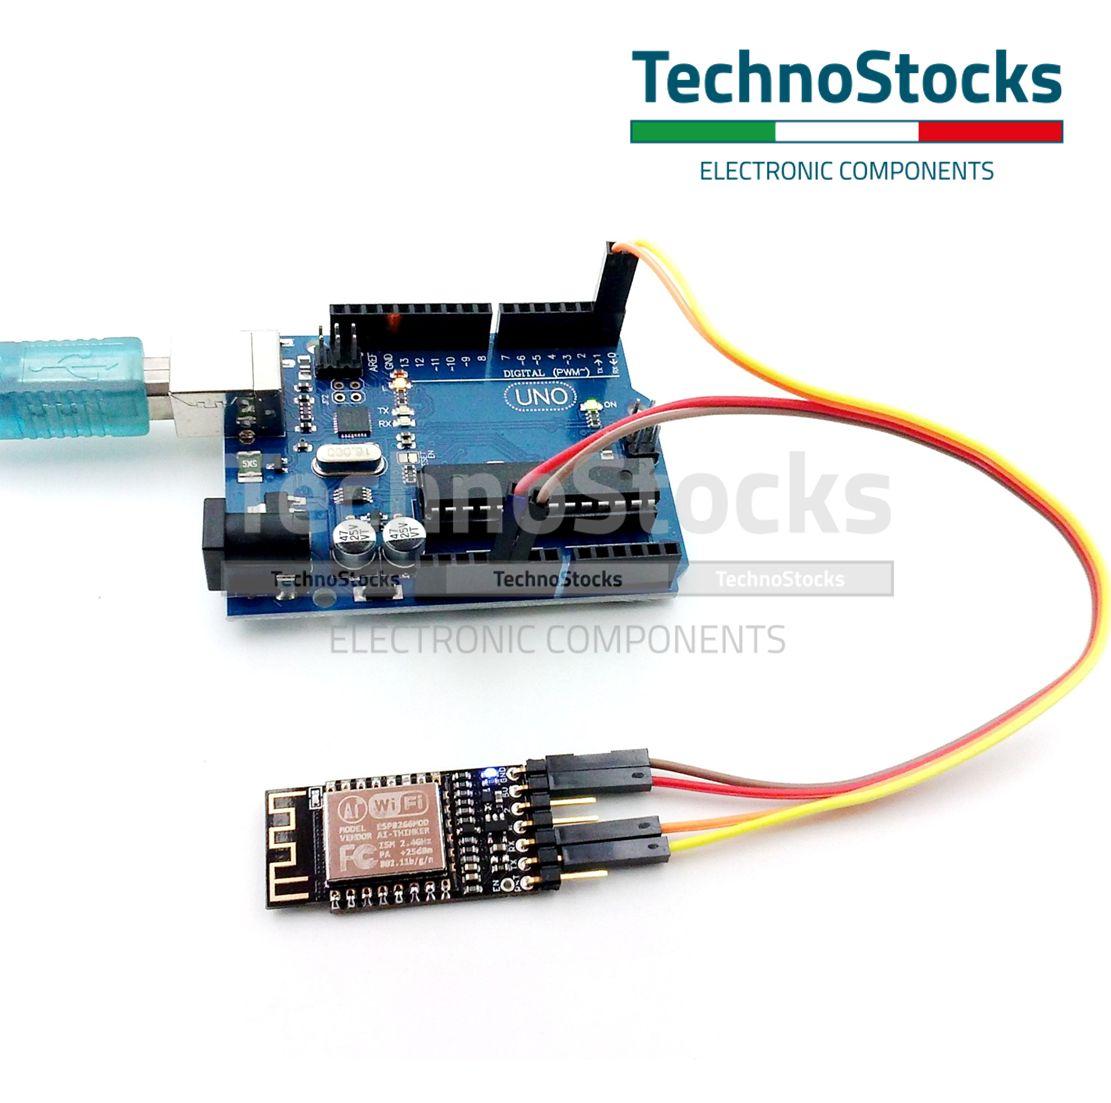 KIT-2-miuPanel-Controllo-Remoto-ESP8266-WiFi-Free-IoT-APP-for-Android-iOS-IoT miniatura 5